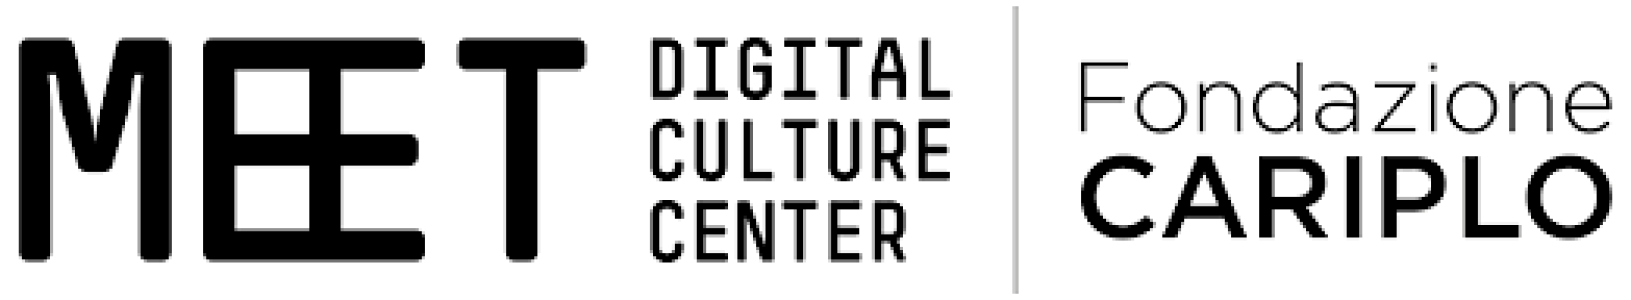 Meet Digital Communication srl